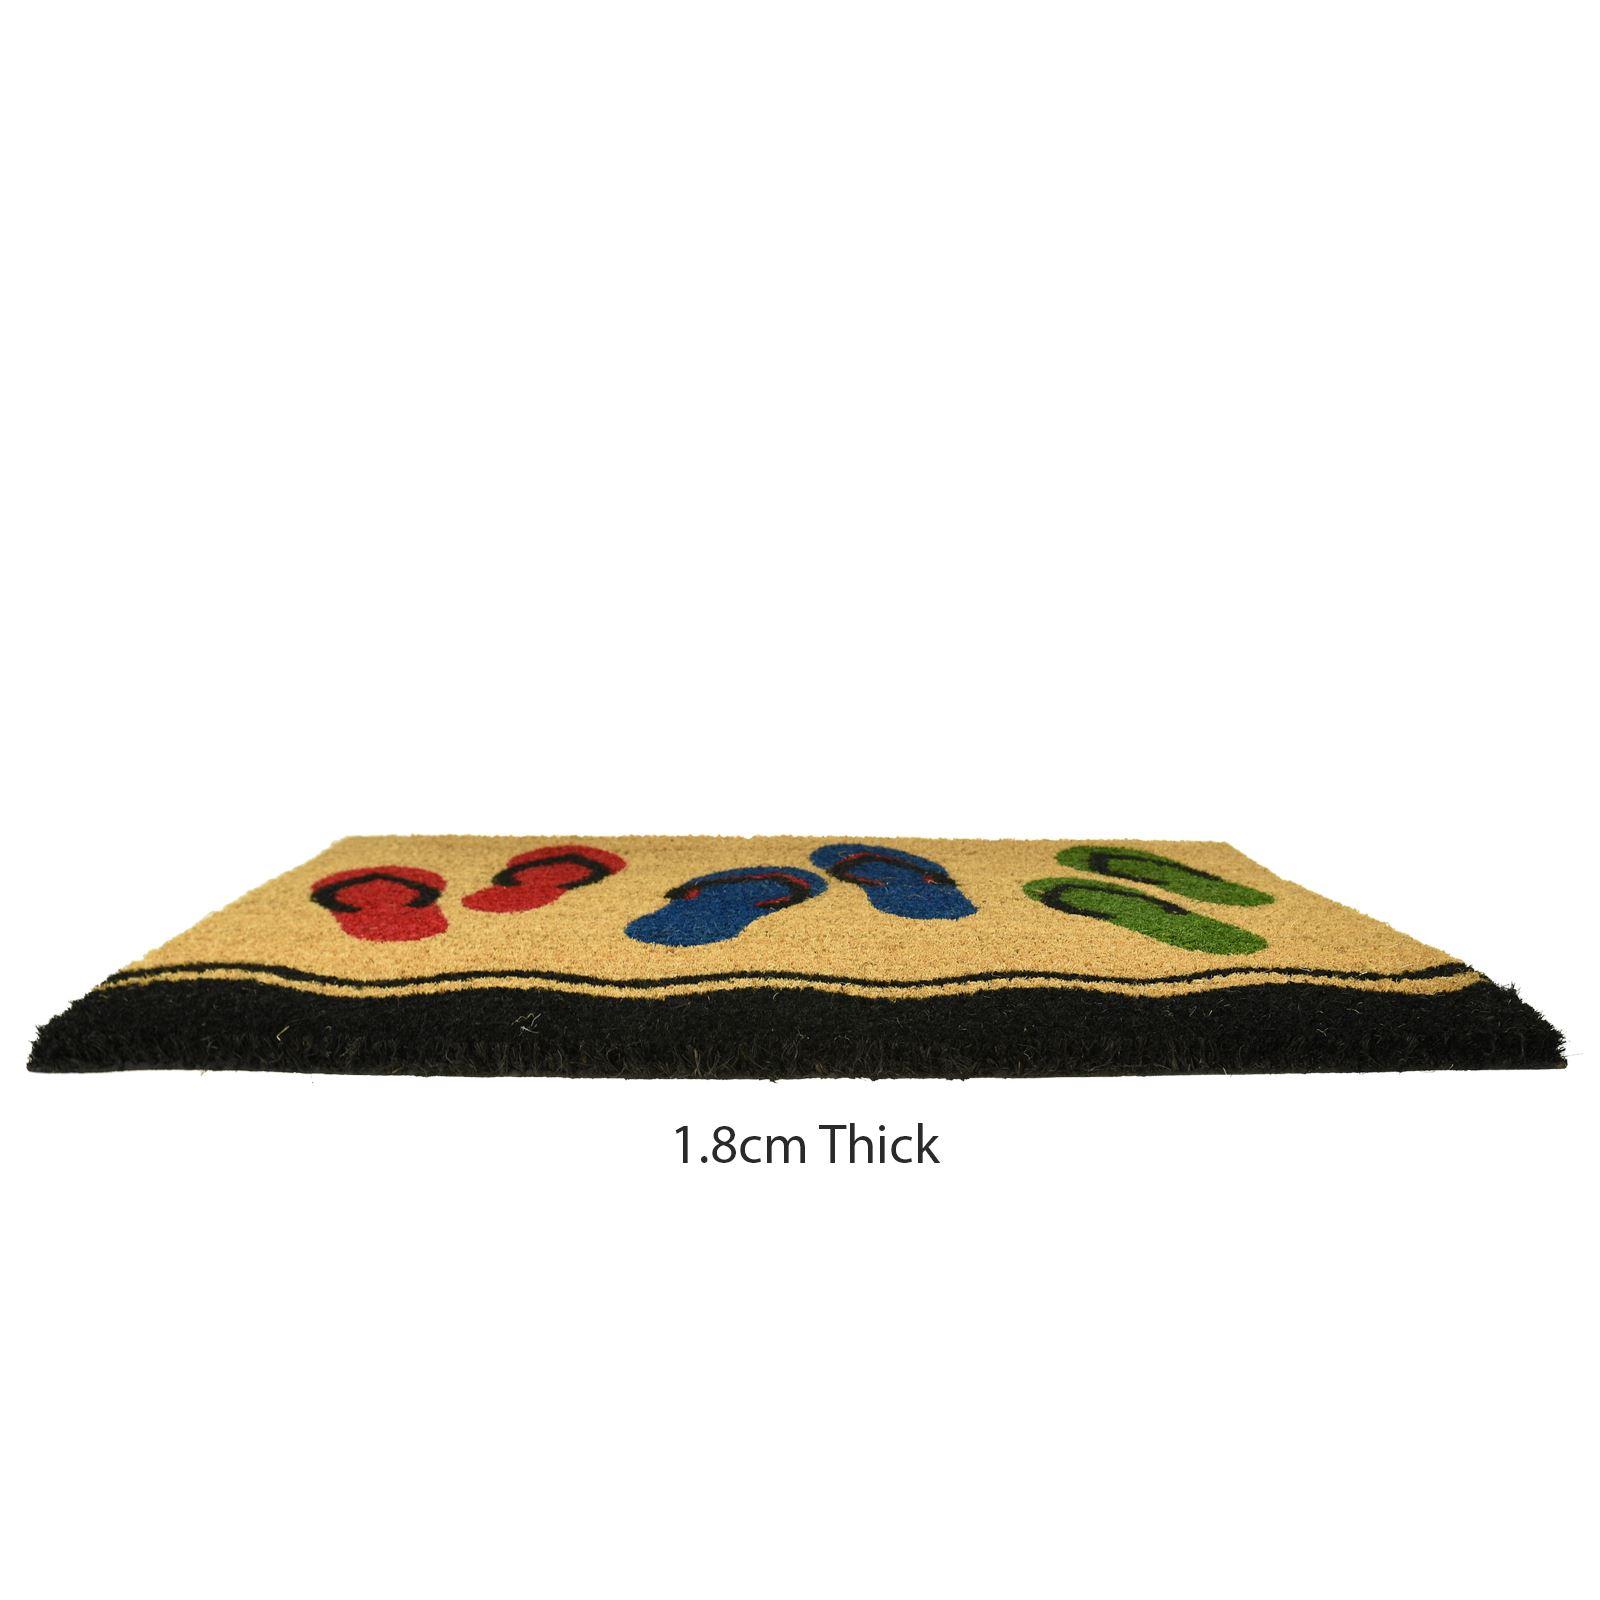 Plain-Non-Slip-Door-Mat-Tough-Natural-Coir-PVC-Back-Welcome-Doormat-40-x-60cm miniatura 47